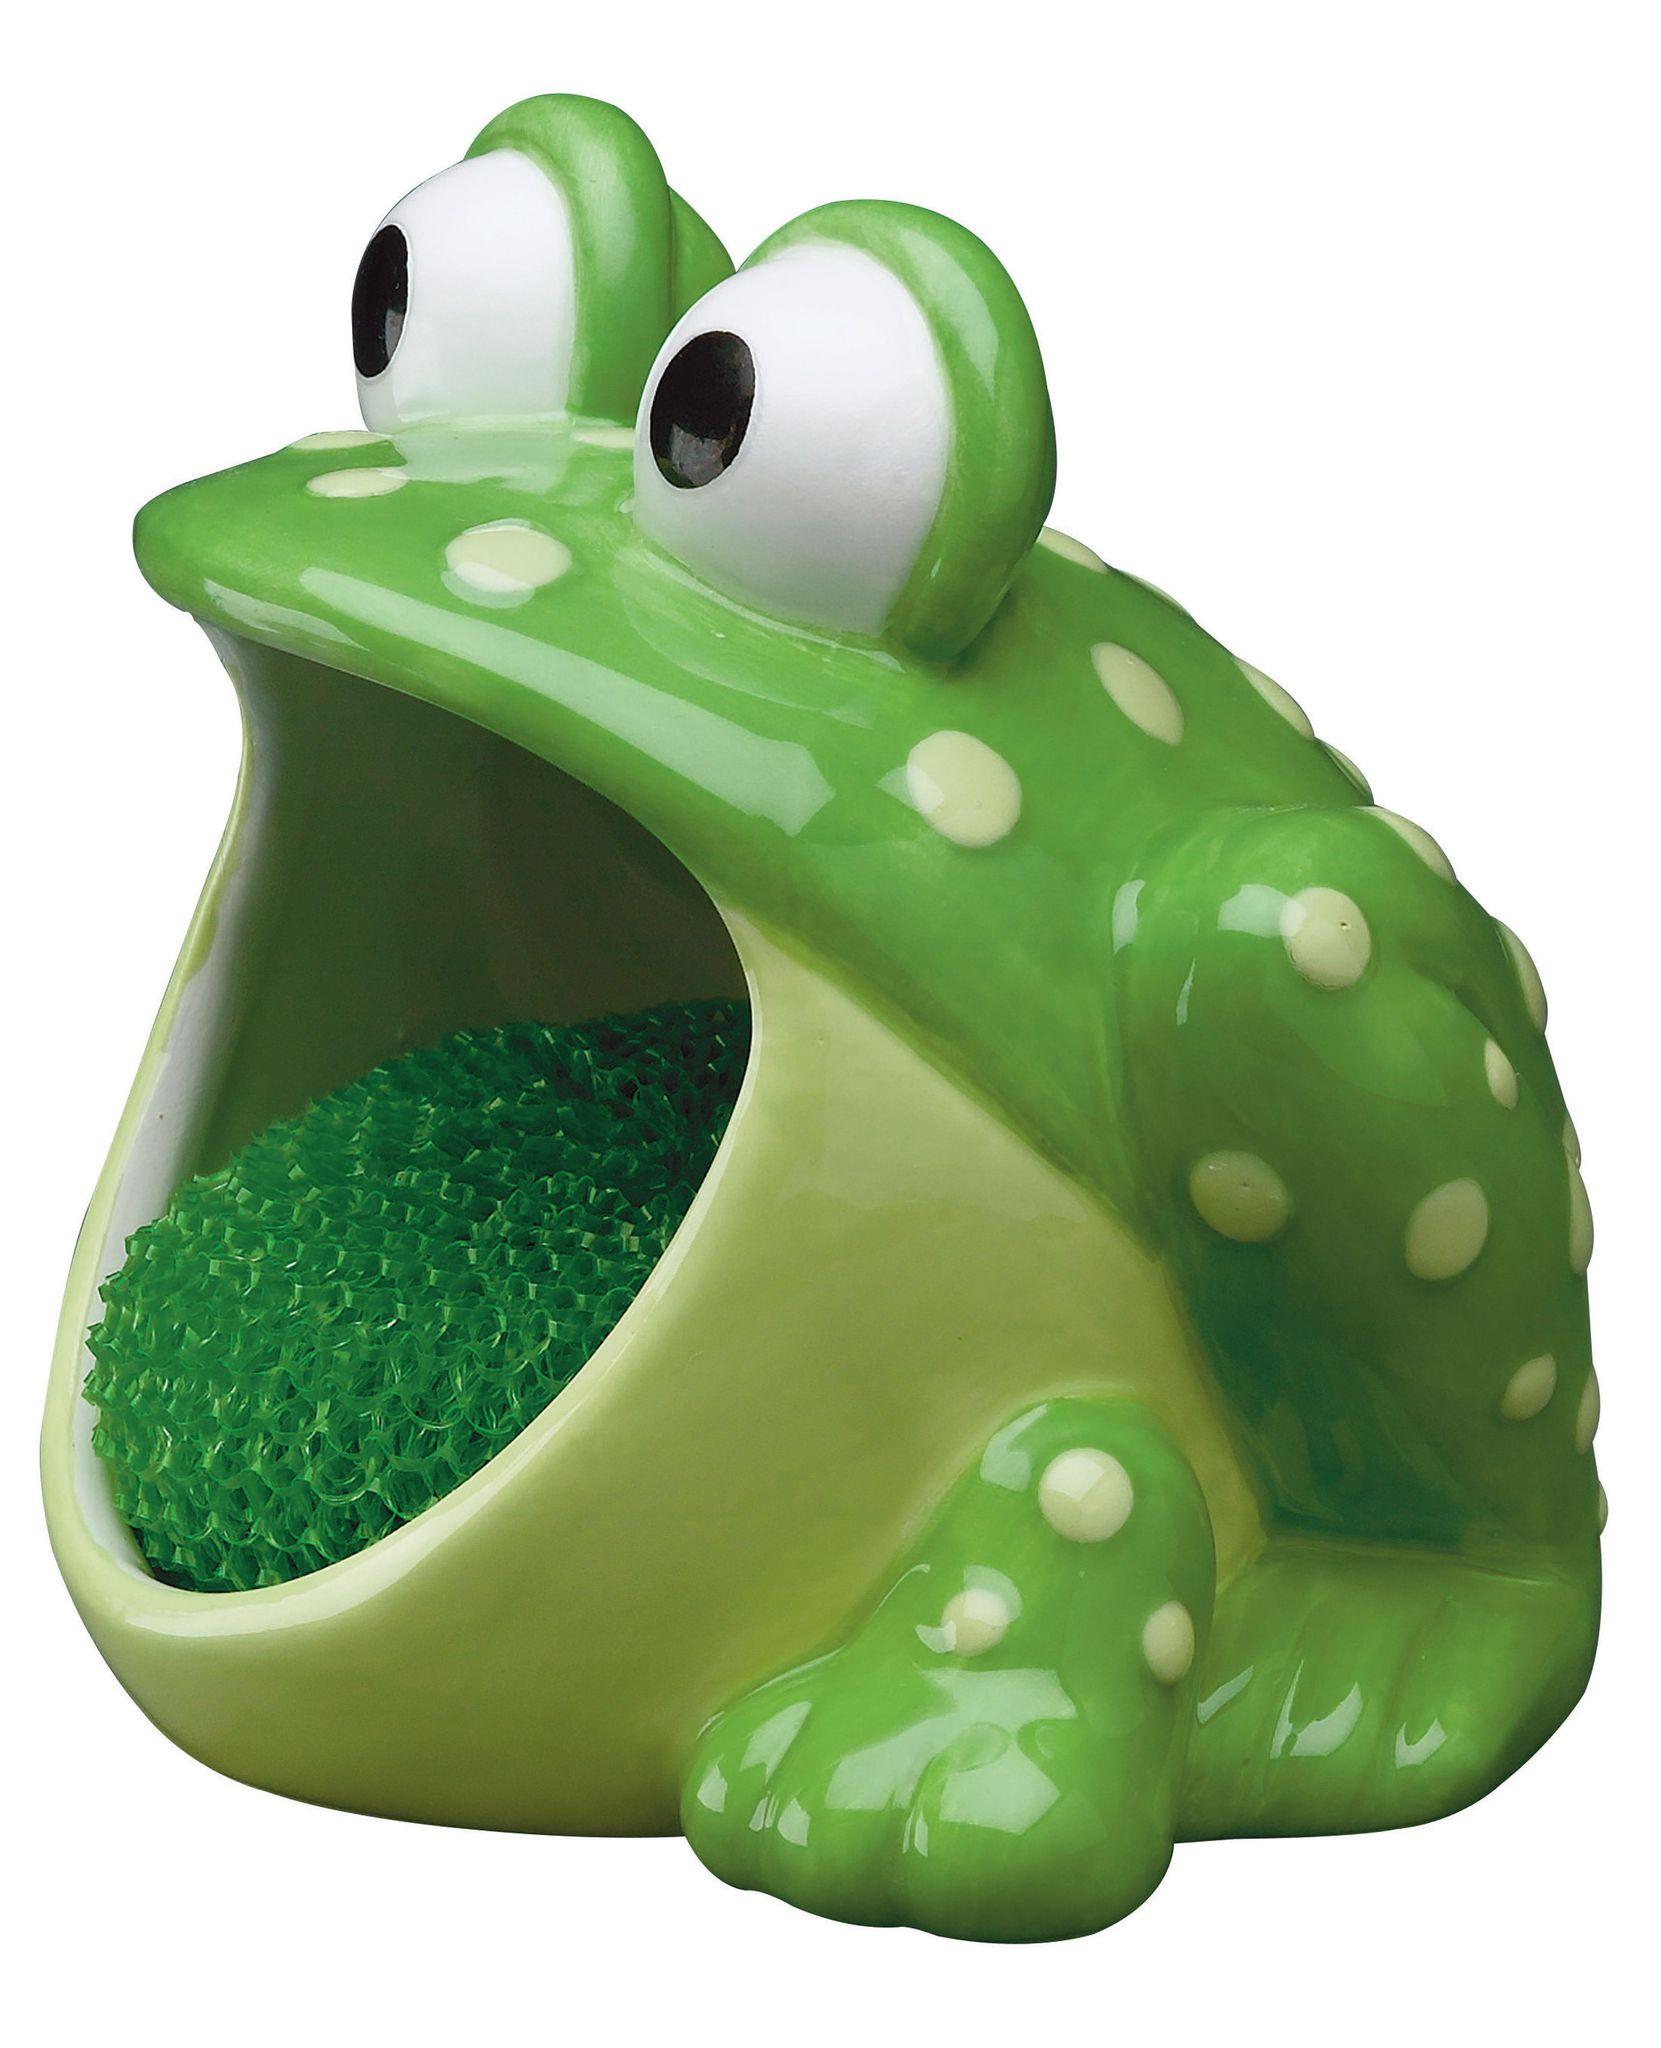 Кухня Держатель для губок/мочалок Boston Warehouse Frog derzhatel-dlya-gubokmochalok-boston-warehouse-frog-ssha-kitay.jpg